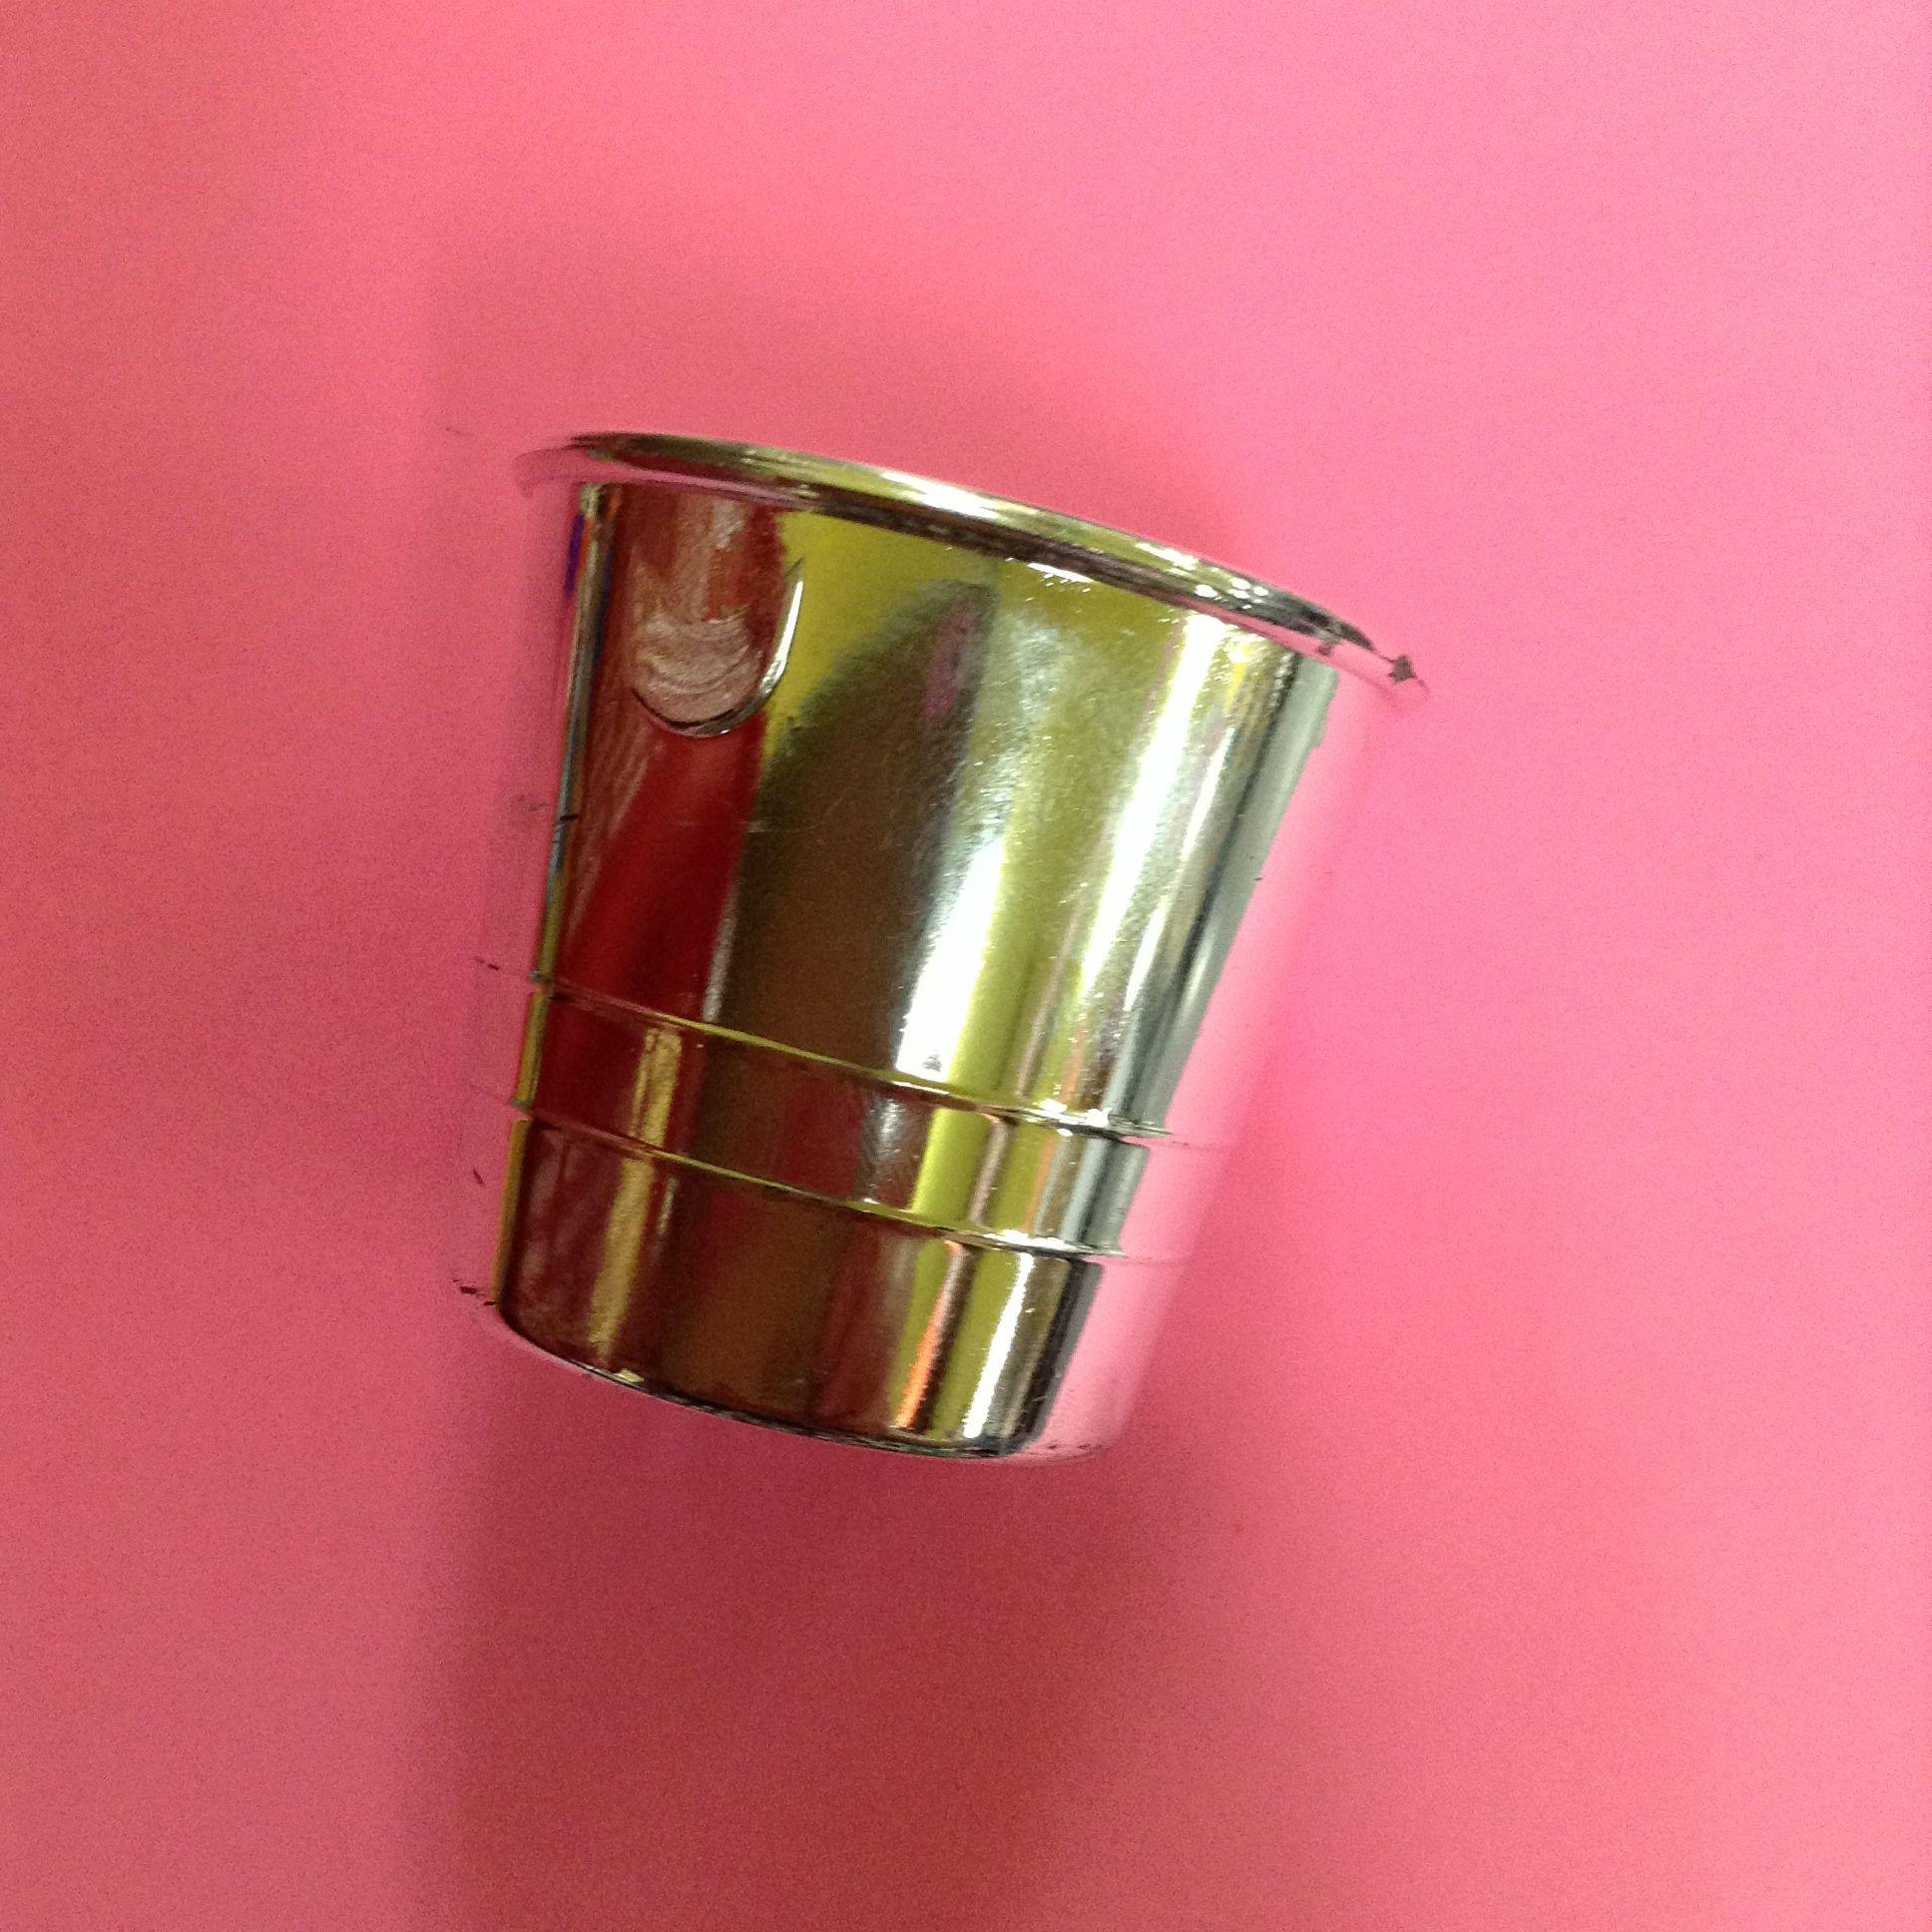 Mini champagne bucket mini champagne champagne buckets